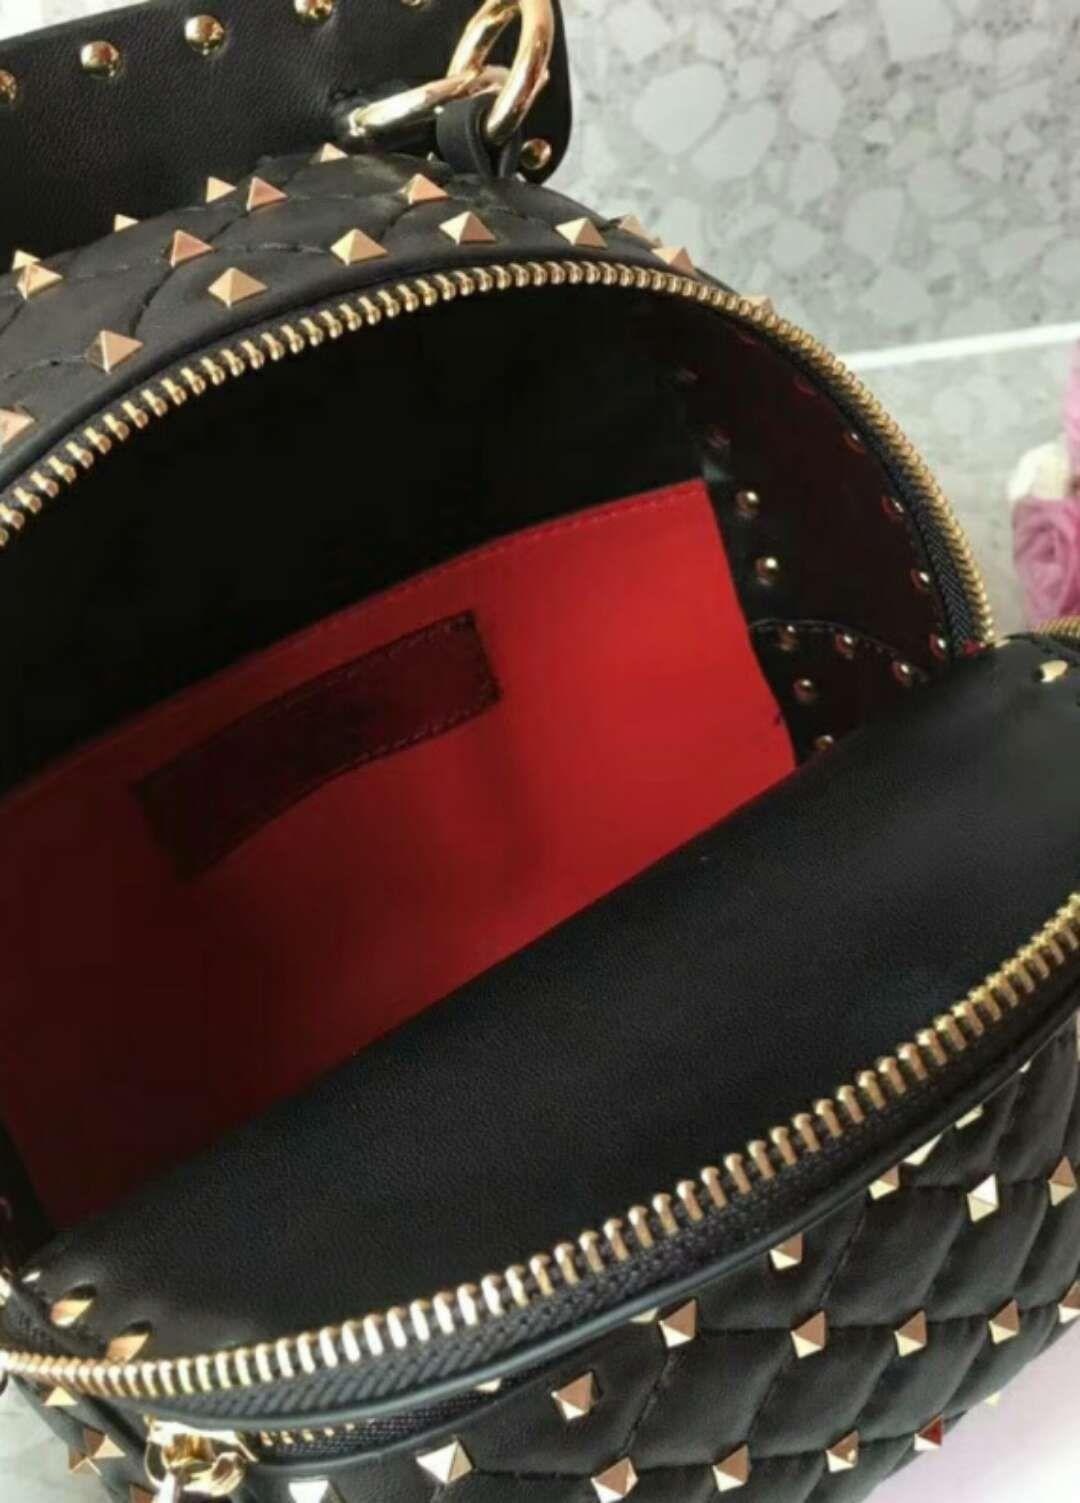 new couplebackbag fashion show full start diamond lattice sheep skin genuineleathermenwomenschoolbagtravelbackpack dot rivet 17cm